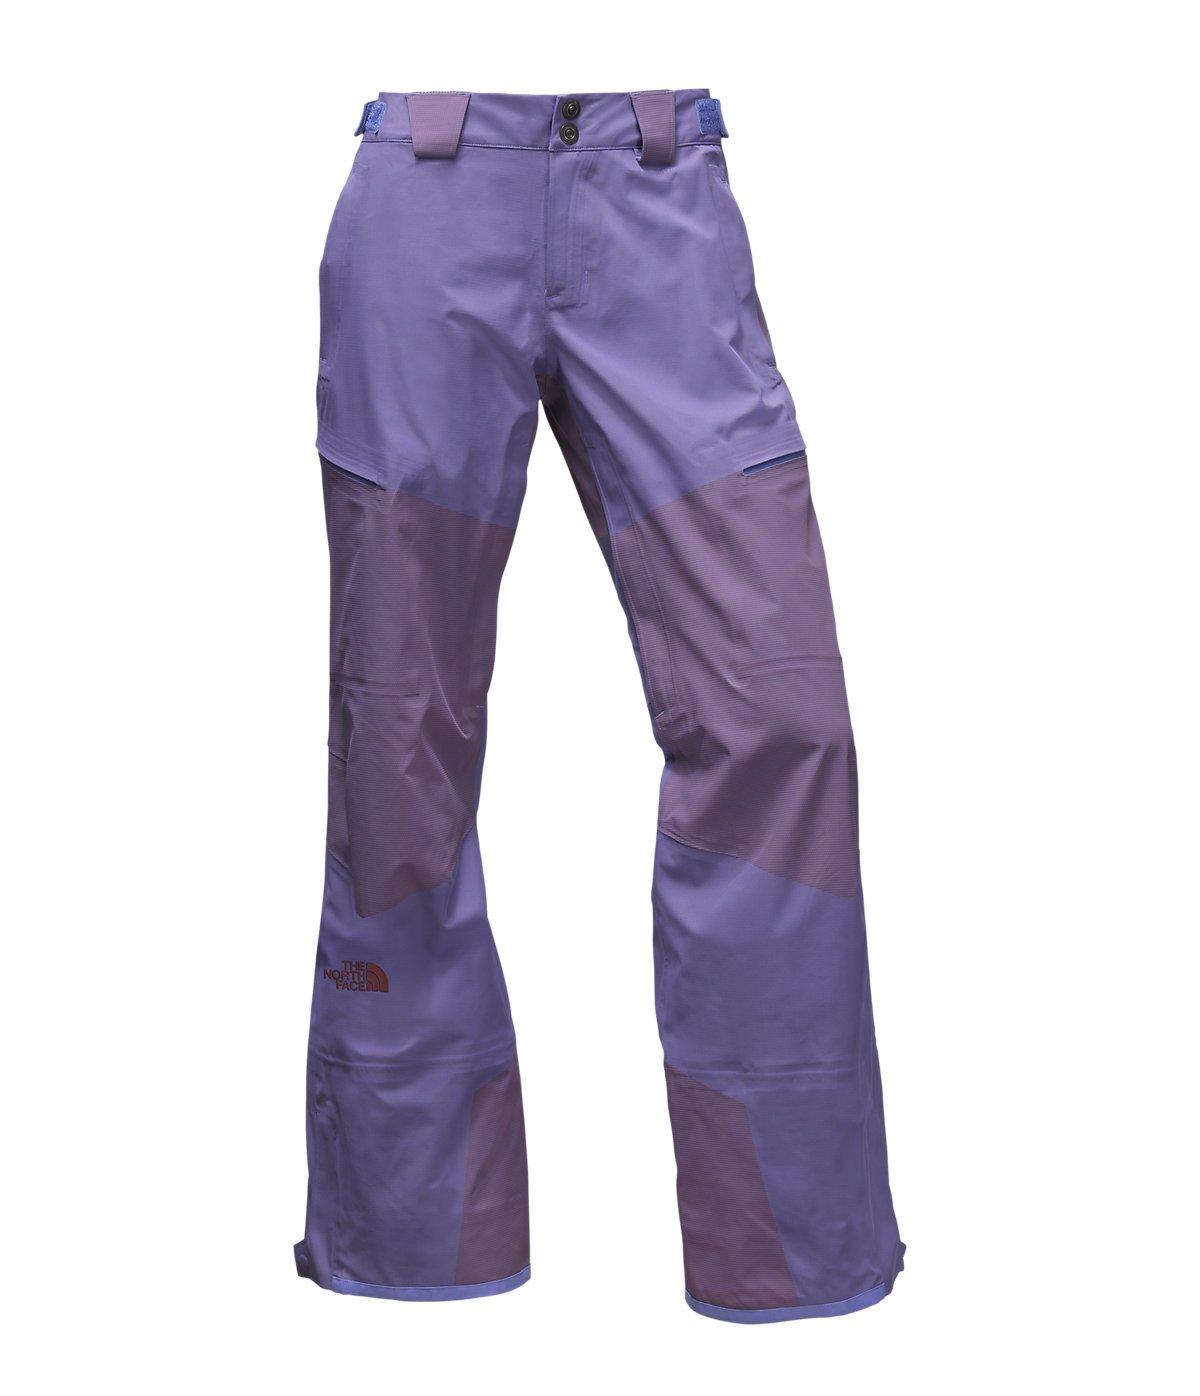 Women's The North Face Fuseform Brigandine 3L Snow Pants Medium Blue Fuse